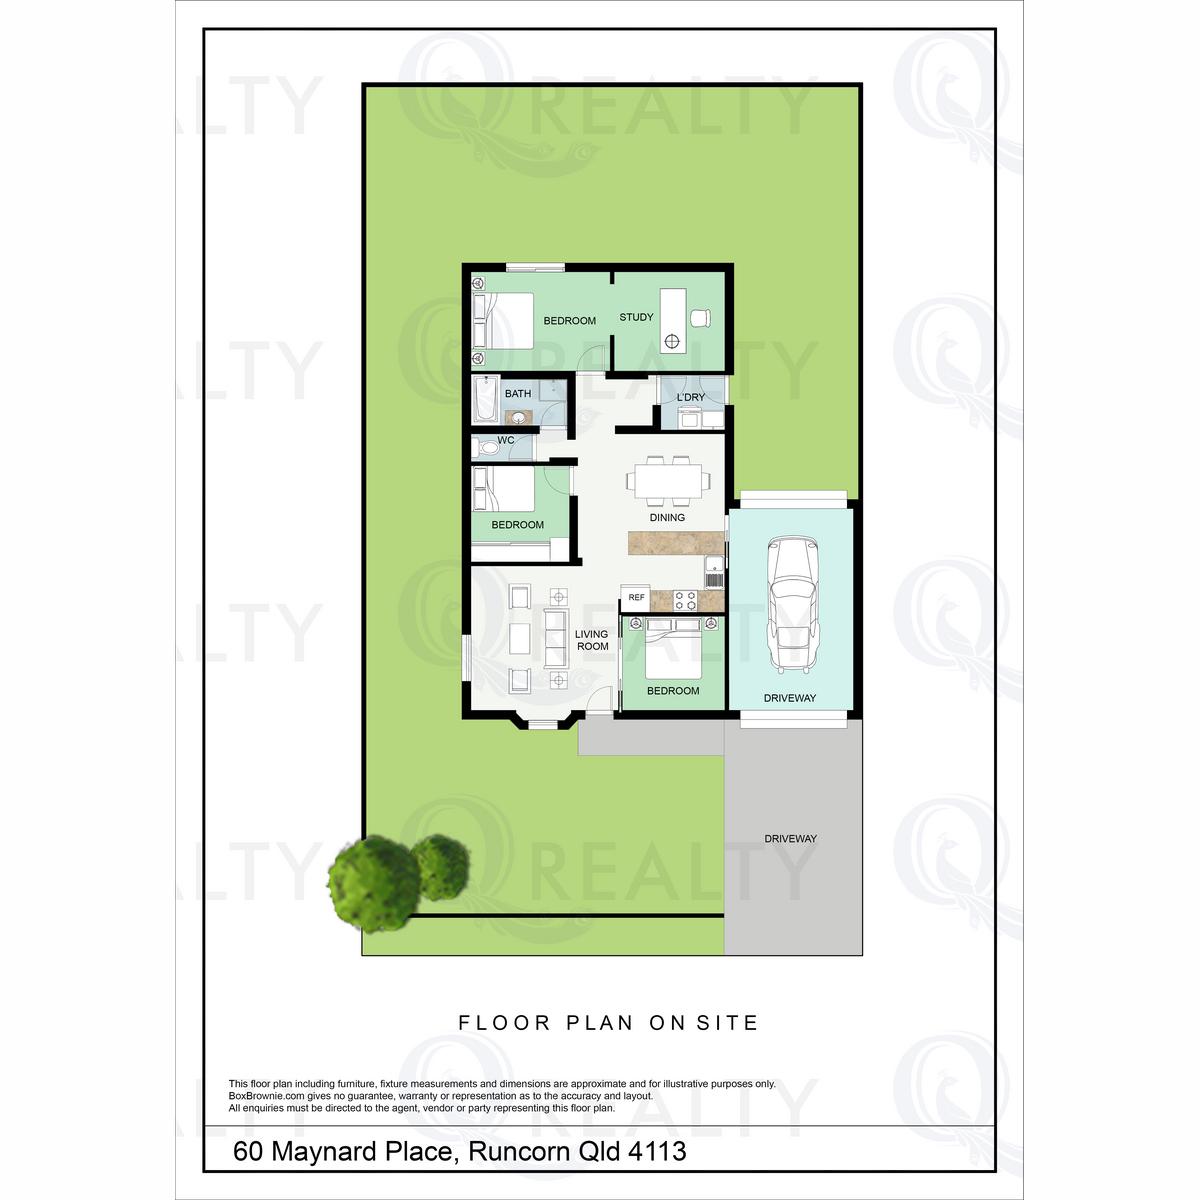 60 Maynard Place, Runcorn  QLD  4113